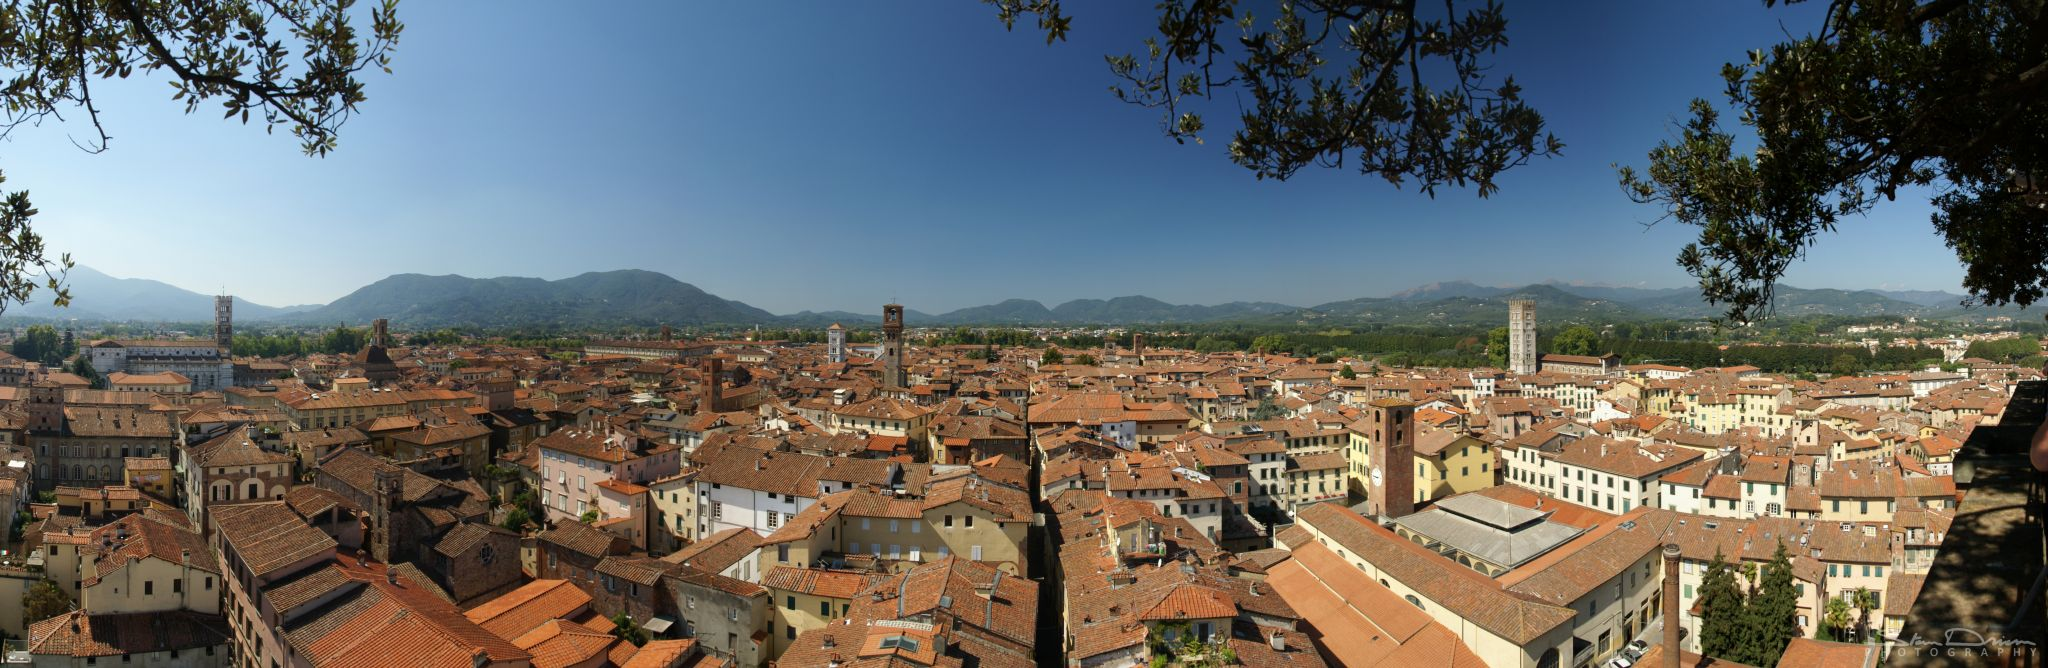 Lucca overlook, Italy